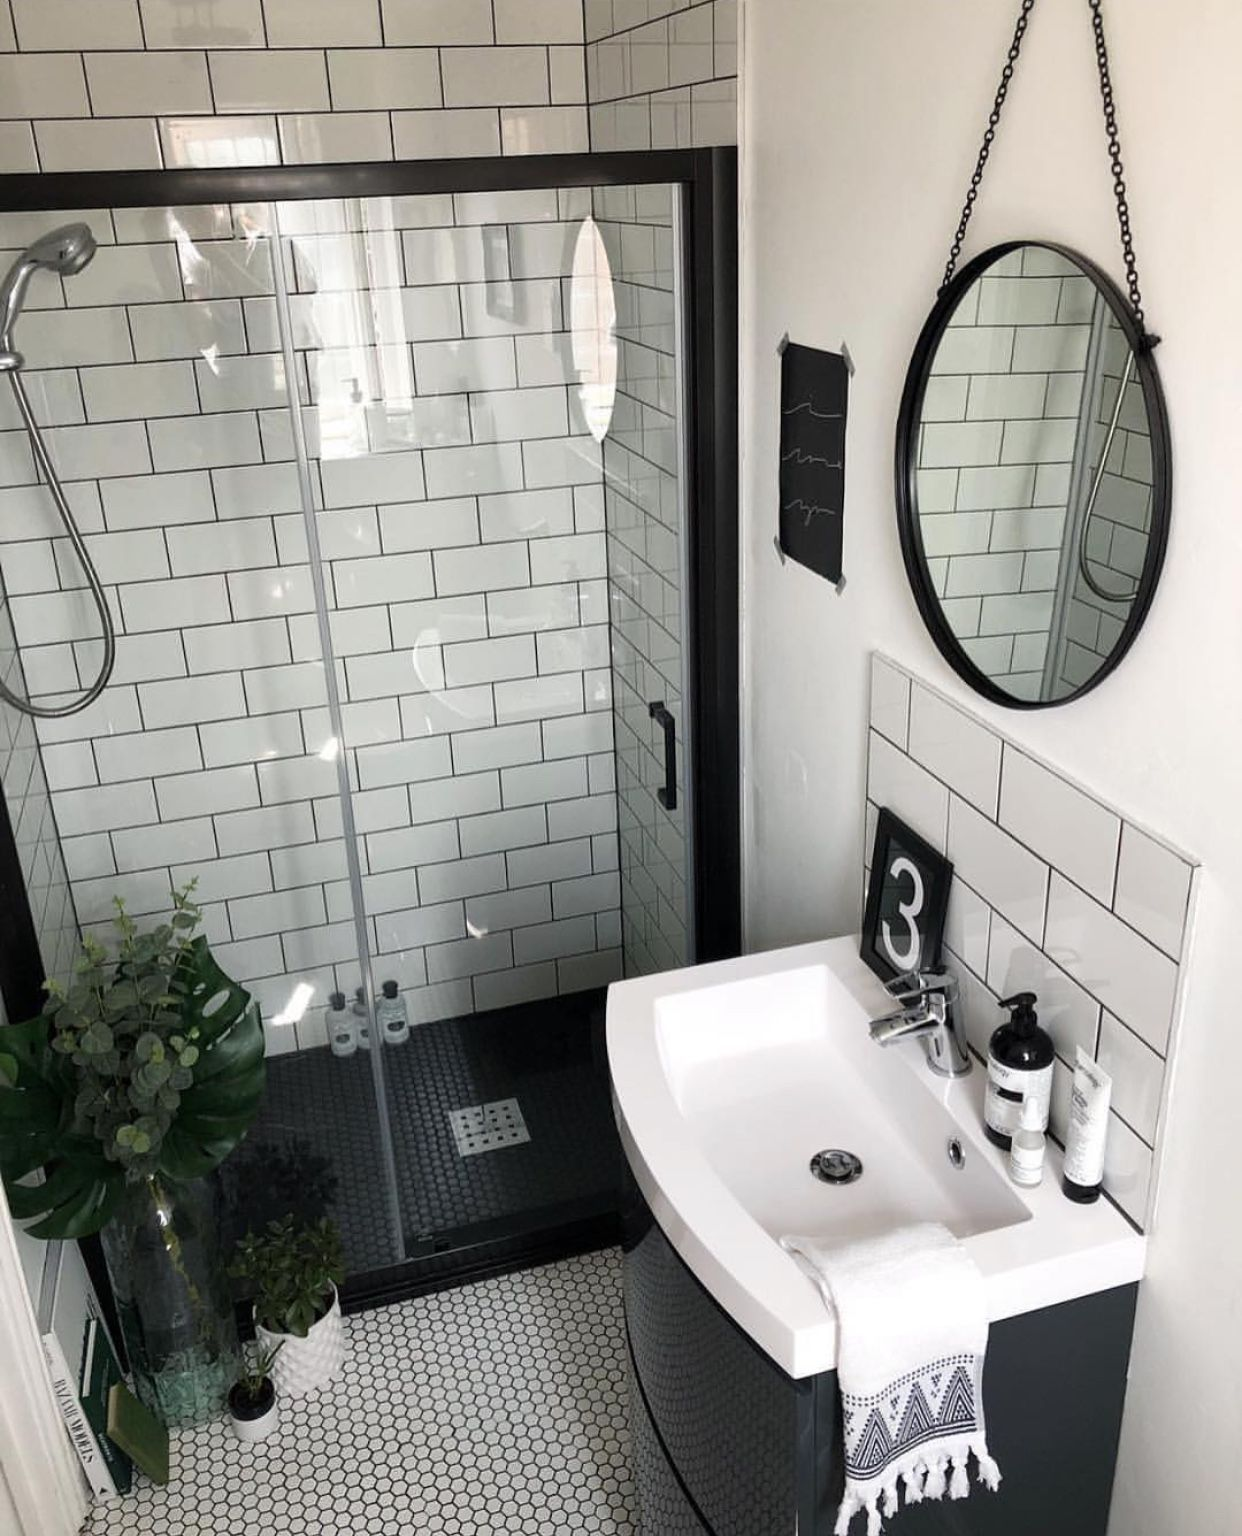 Small Bathroom Choosing Bathroom Flooring Is Far Different From Choosing Flooring In Other Pa Bathroom Design Small Bathroom Interior Design Small Shower Room